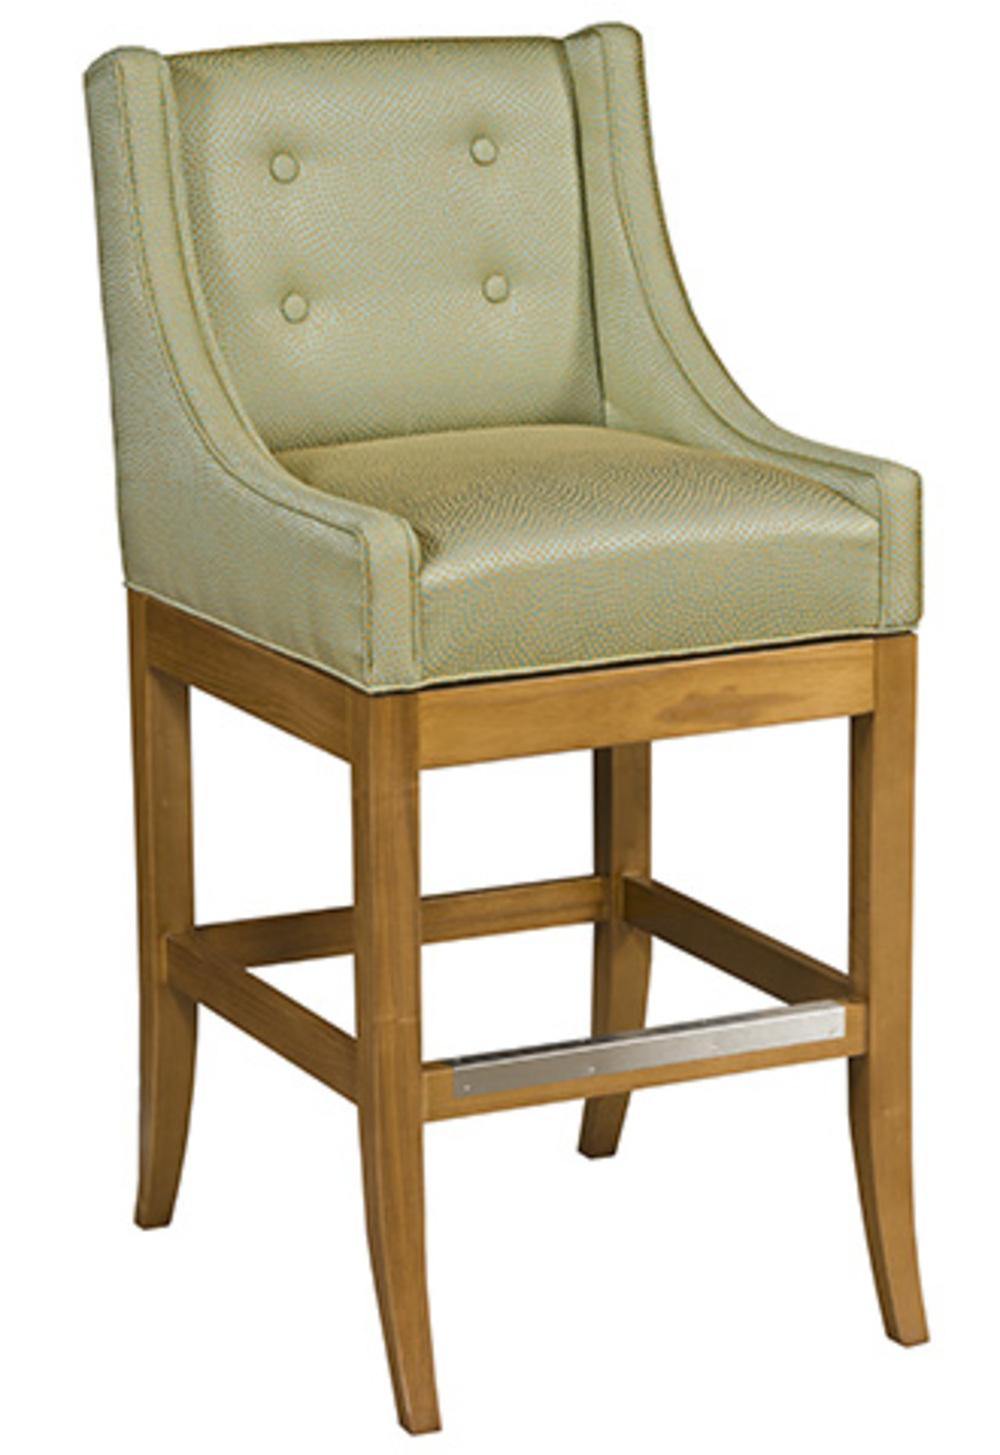 Style Upholstering - Bar Stool